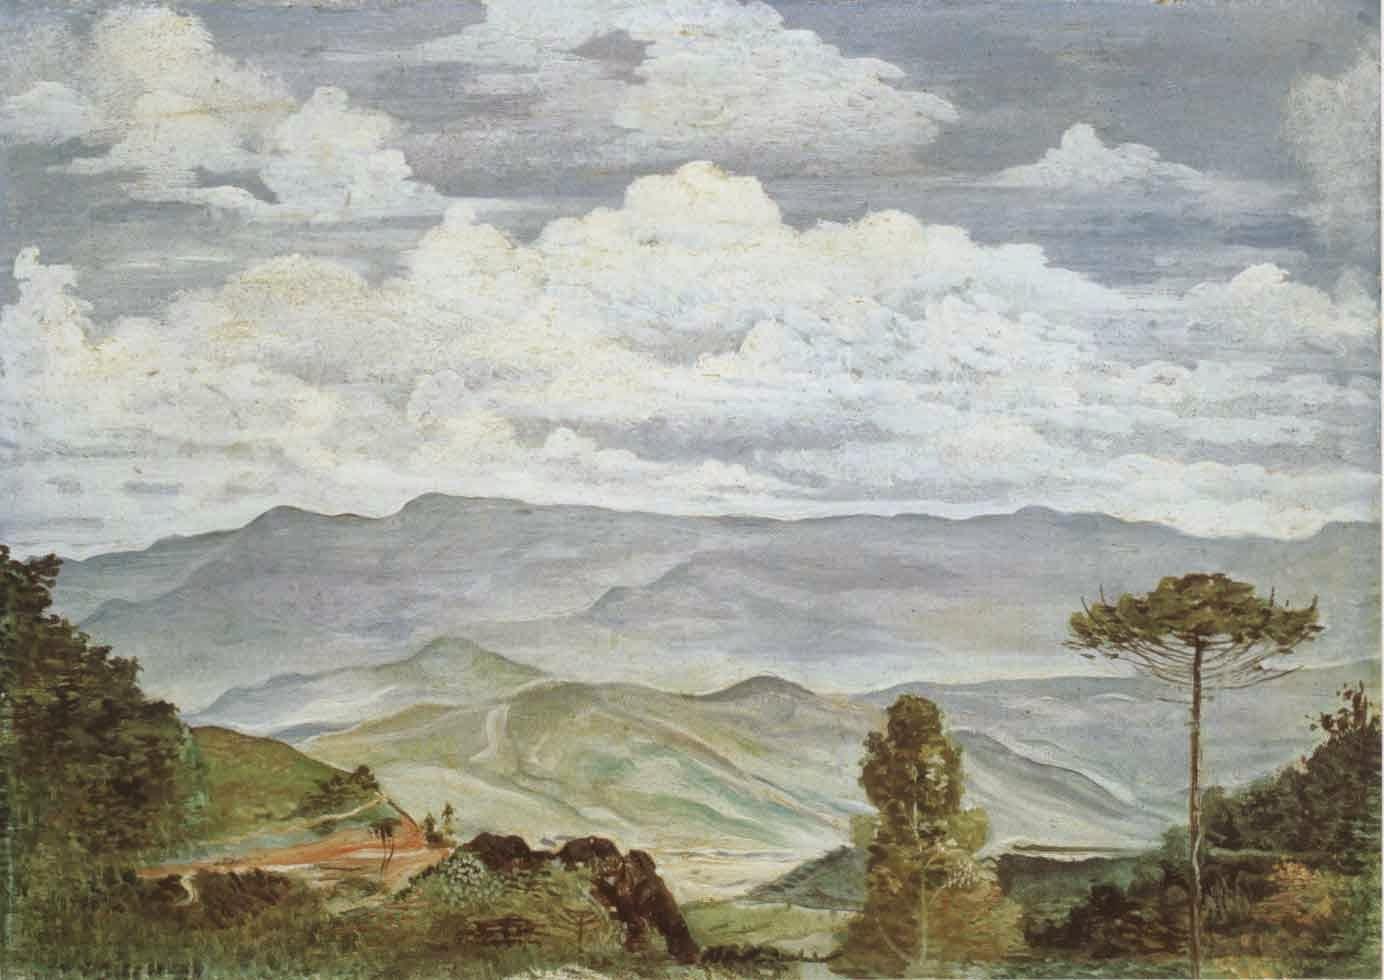 Serra de Itatiaia (Guignard)